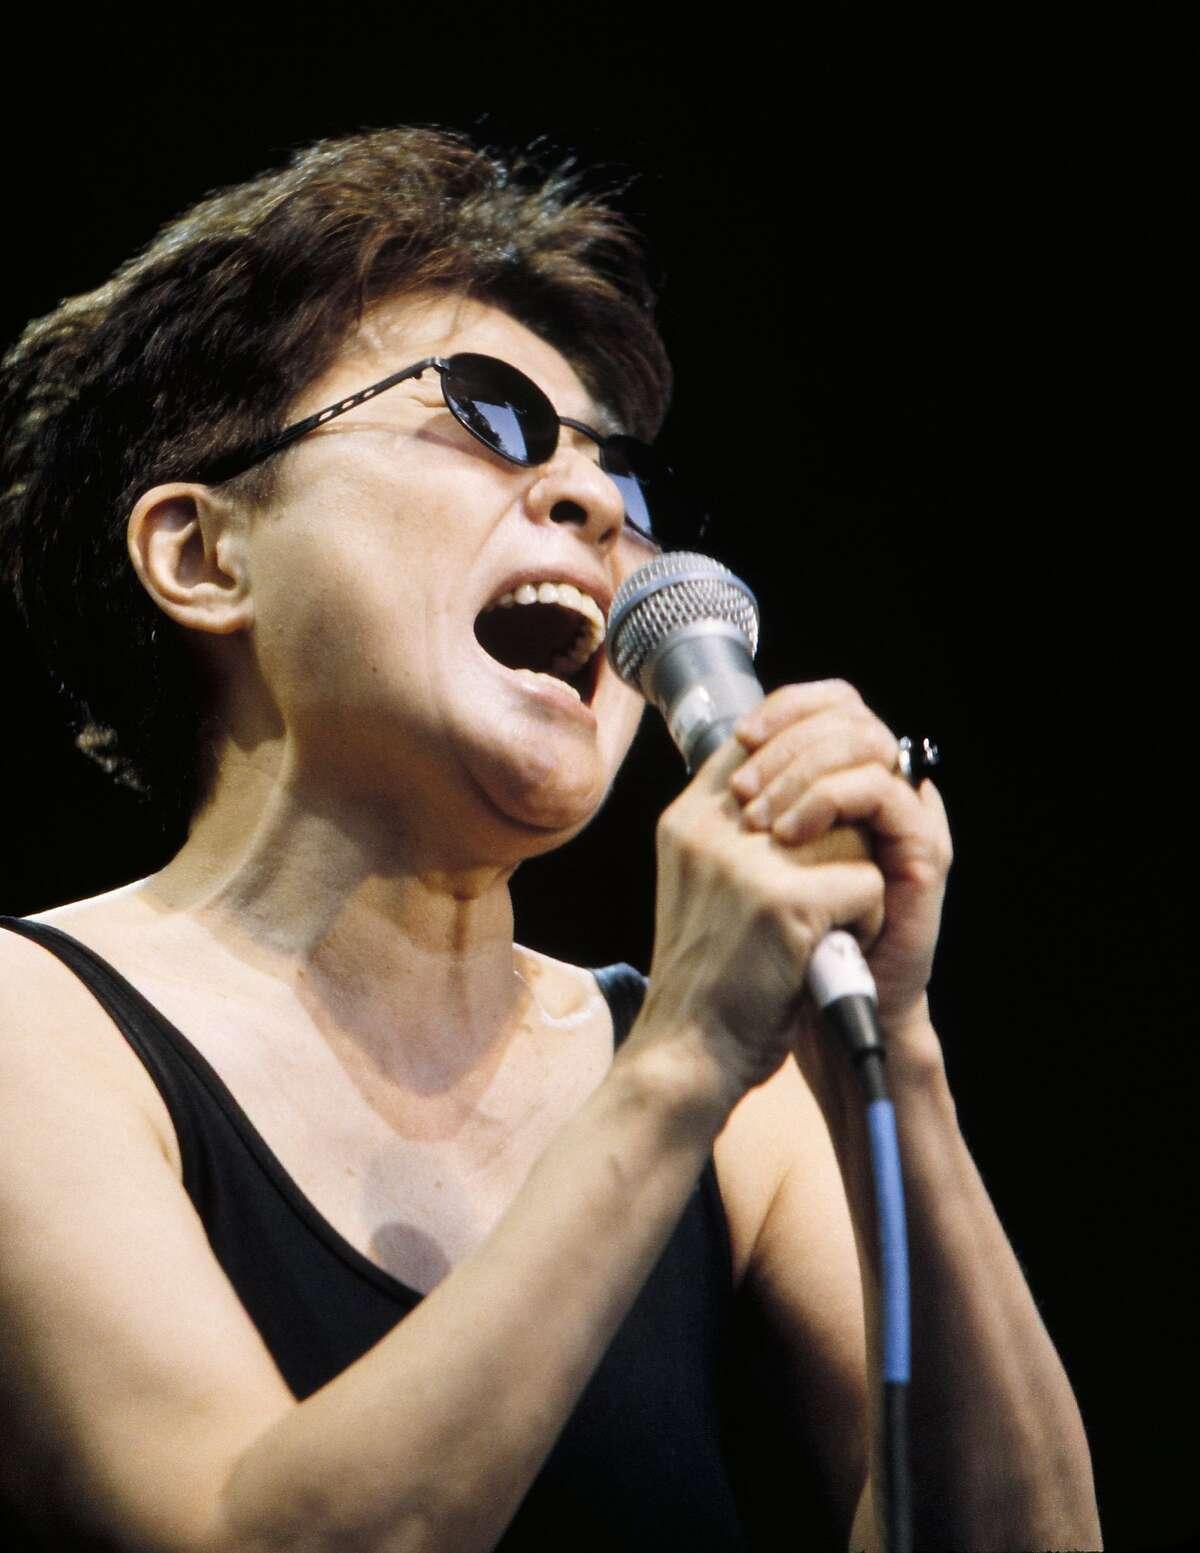 UNSPECIFIED - JANUARY 01: Photo of Yoko ONO (Photo by Andrew Lepley/Redferns)